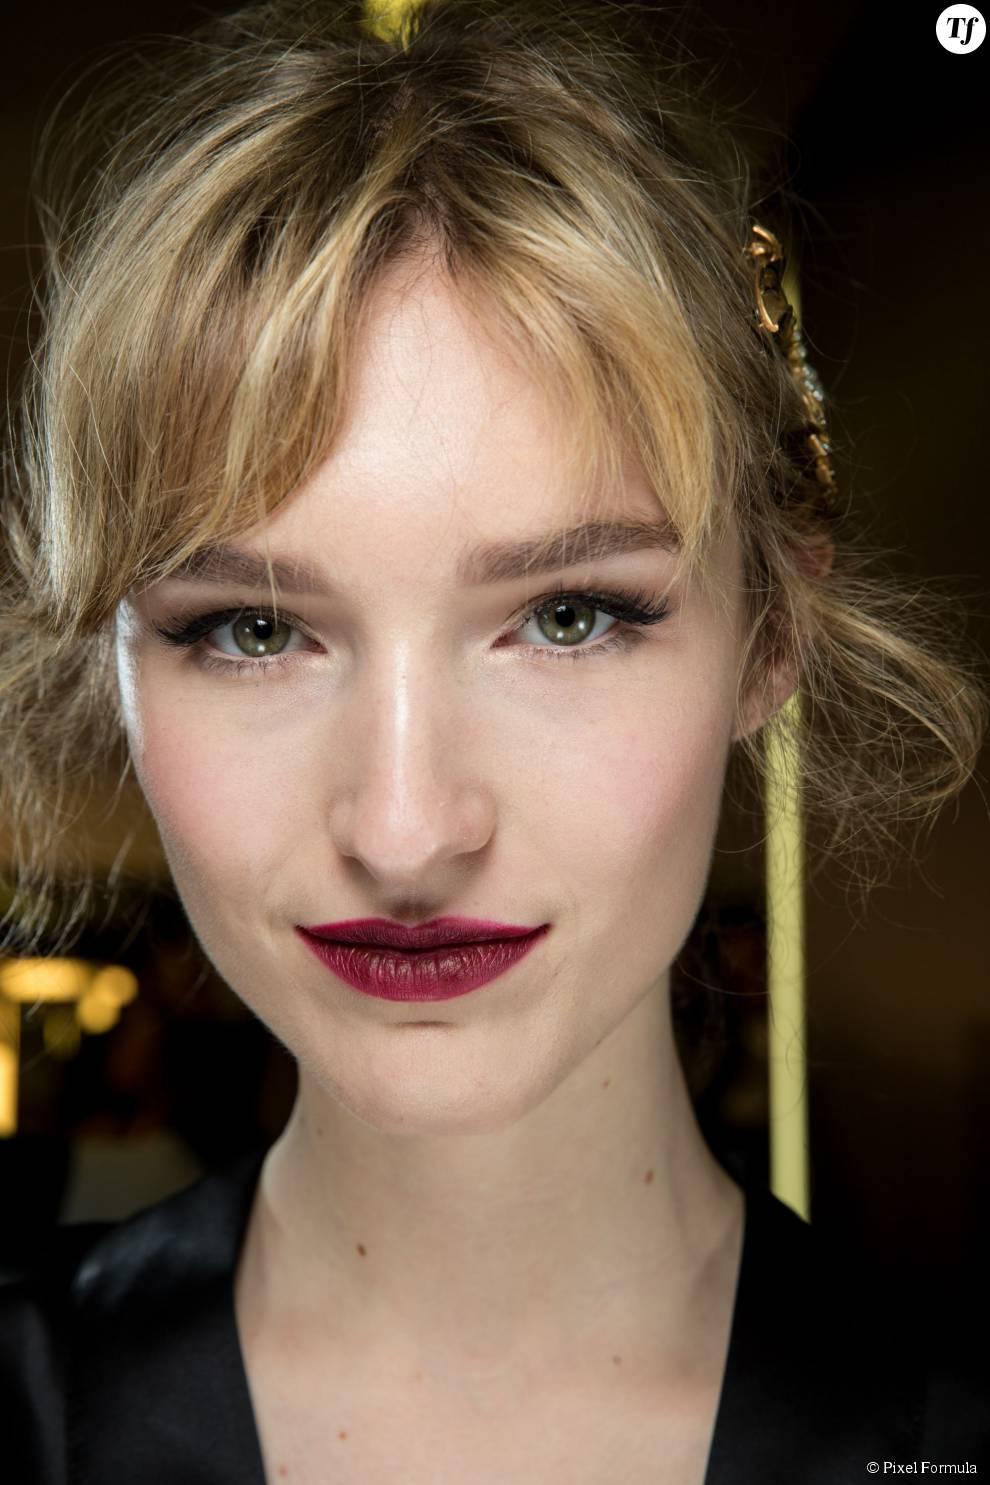 Maquillage : bouche rouge chez Dolce & Gabbana automne-hiver 2015-2016.